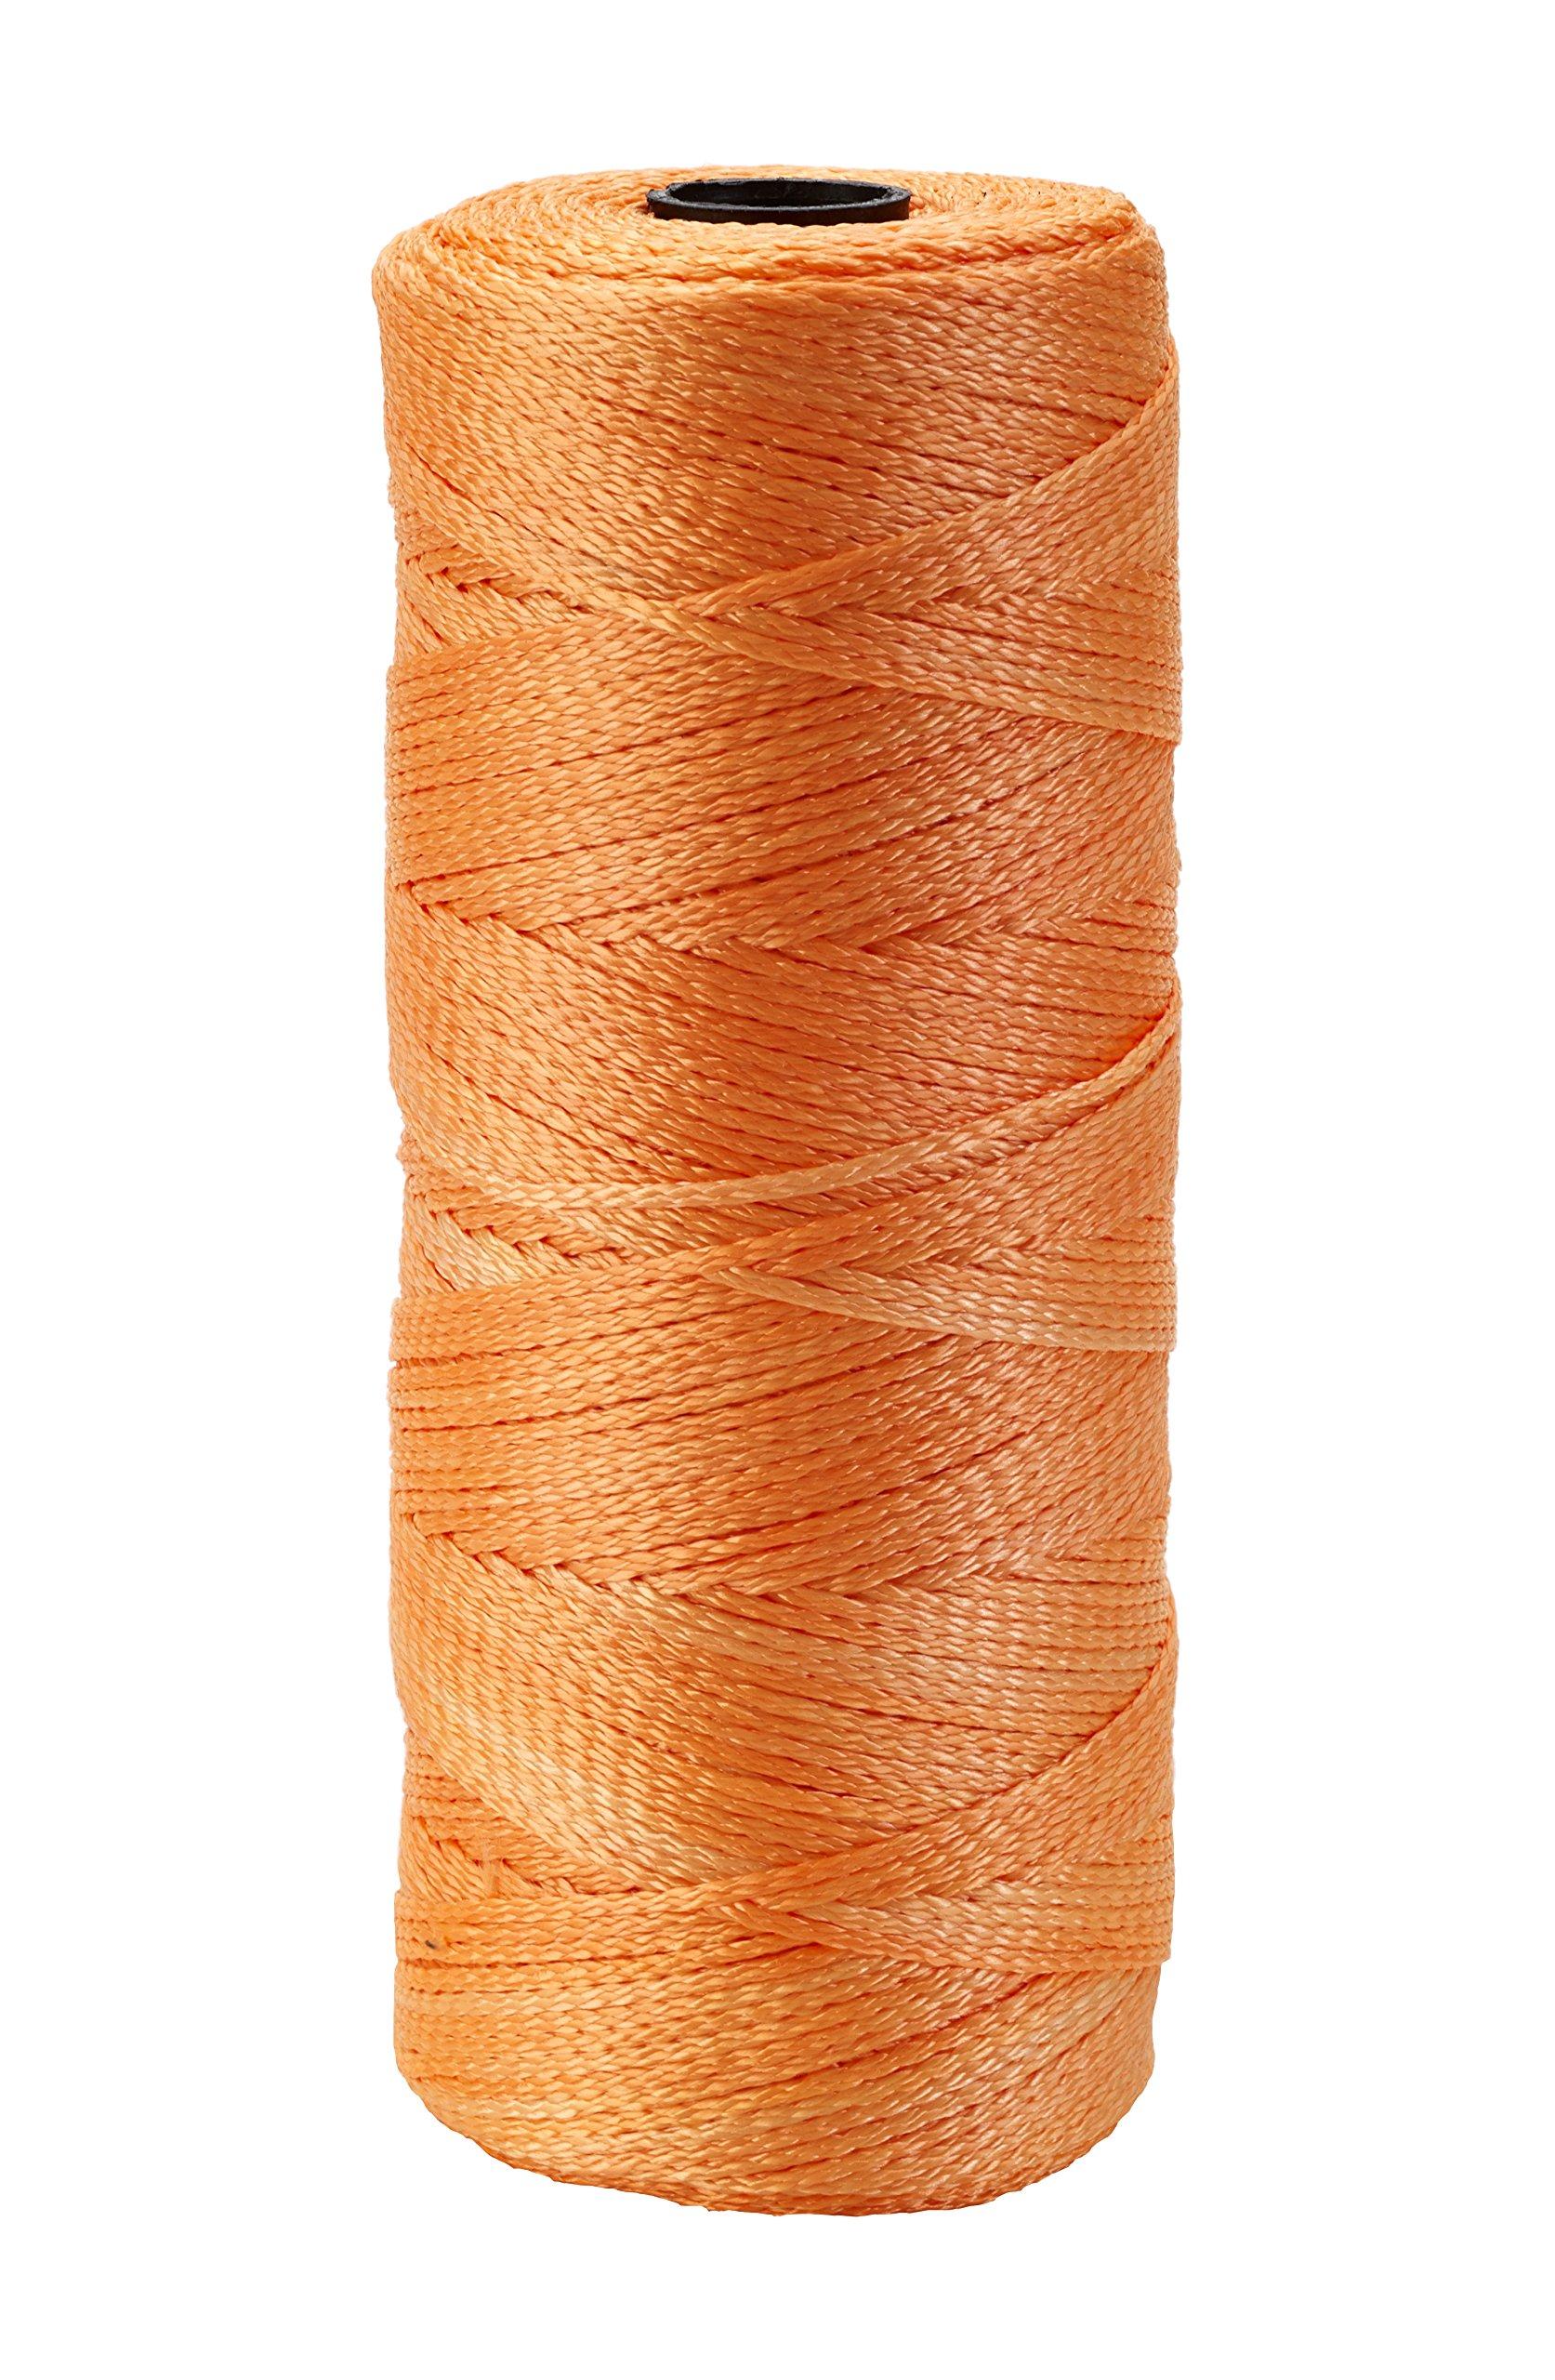 Mutual Industries 14661-145-550 Nylon Mason Twine, 1/2 lb. Twisted, 18 x 550', Glo Orange (Pack of 6)